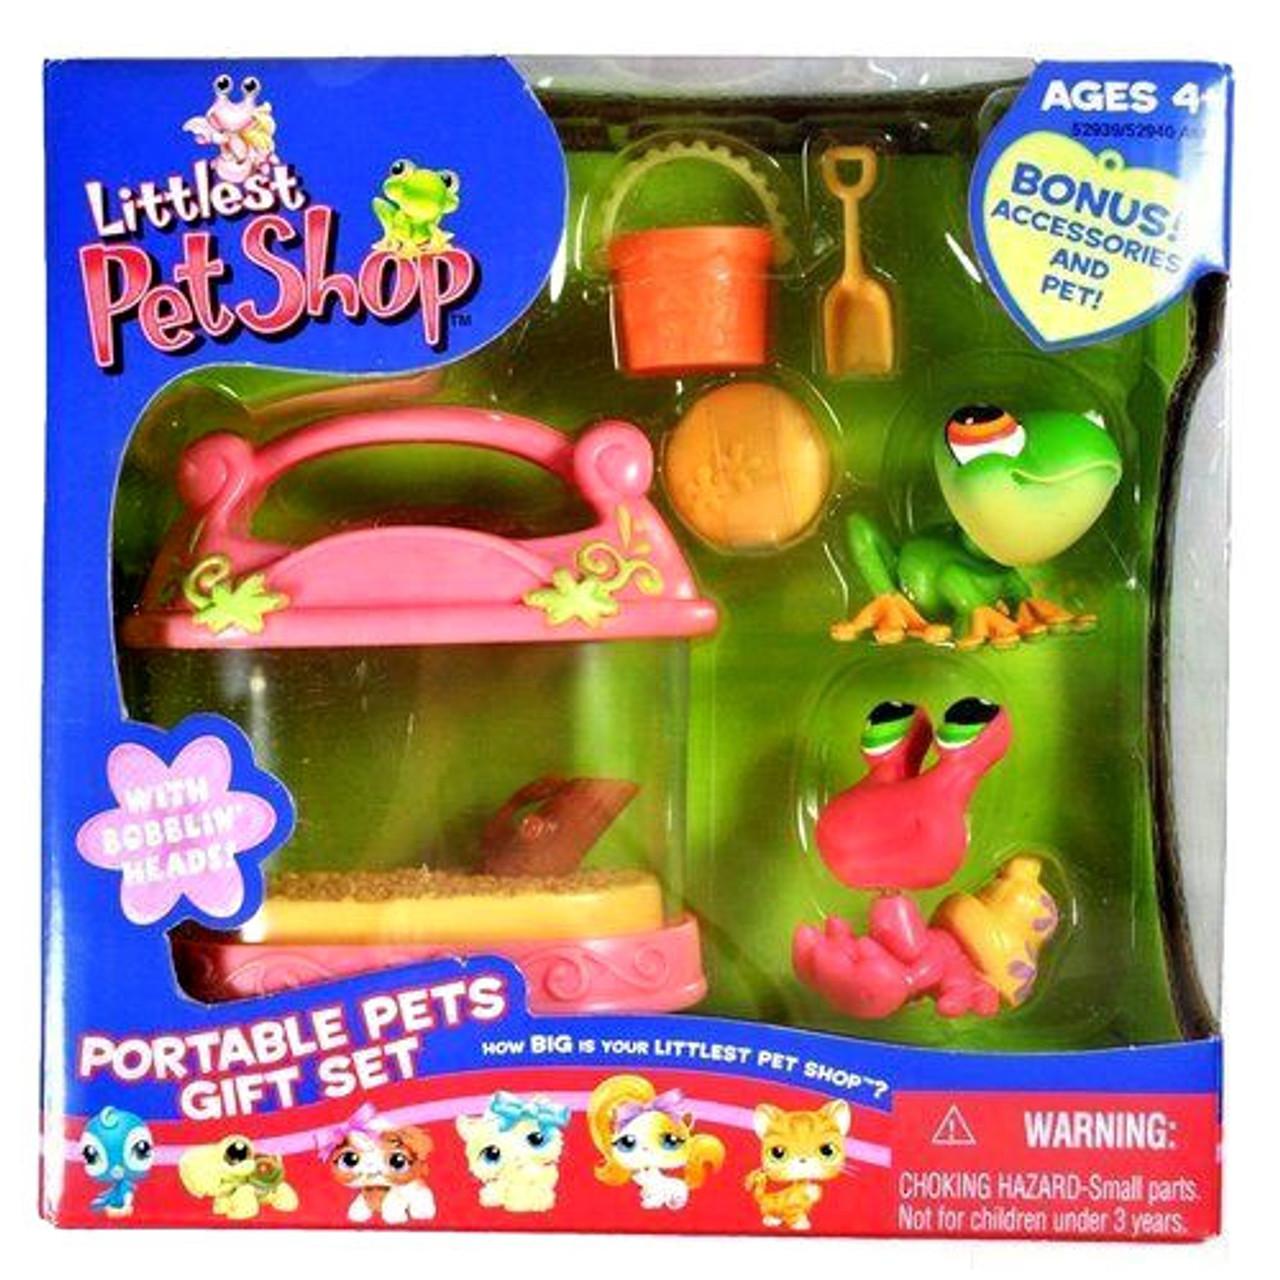 Littlest Pet Shop Portable Pets Tree Frog & Hermit Crab Exclusive Figure 2-Pack